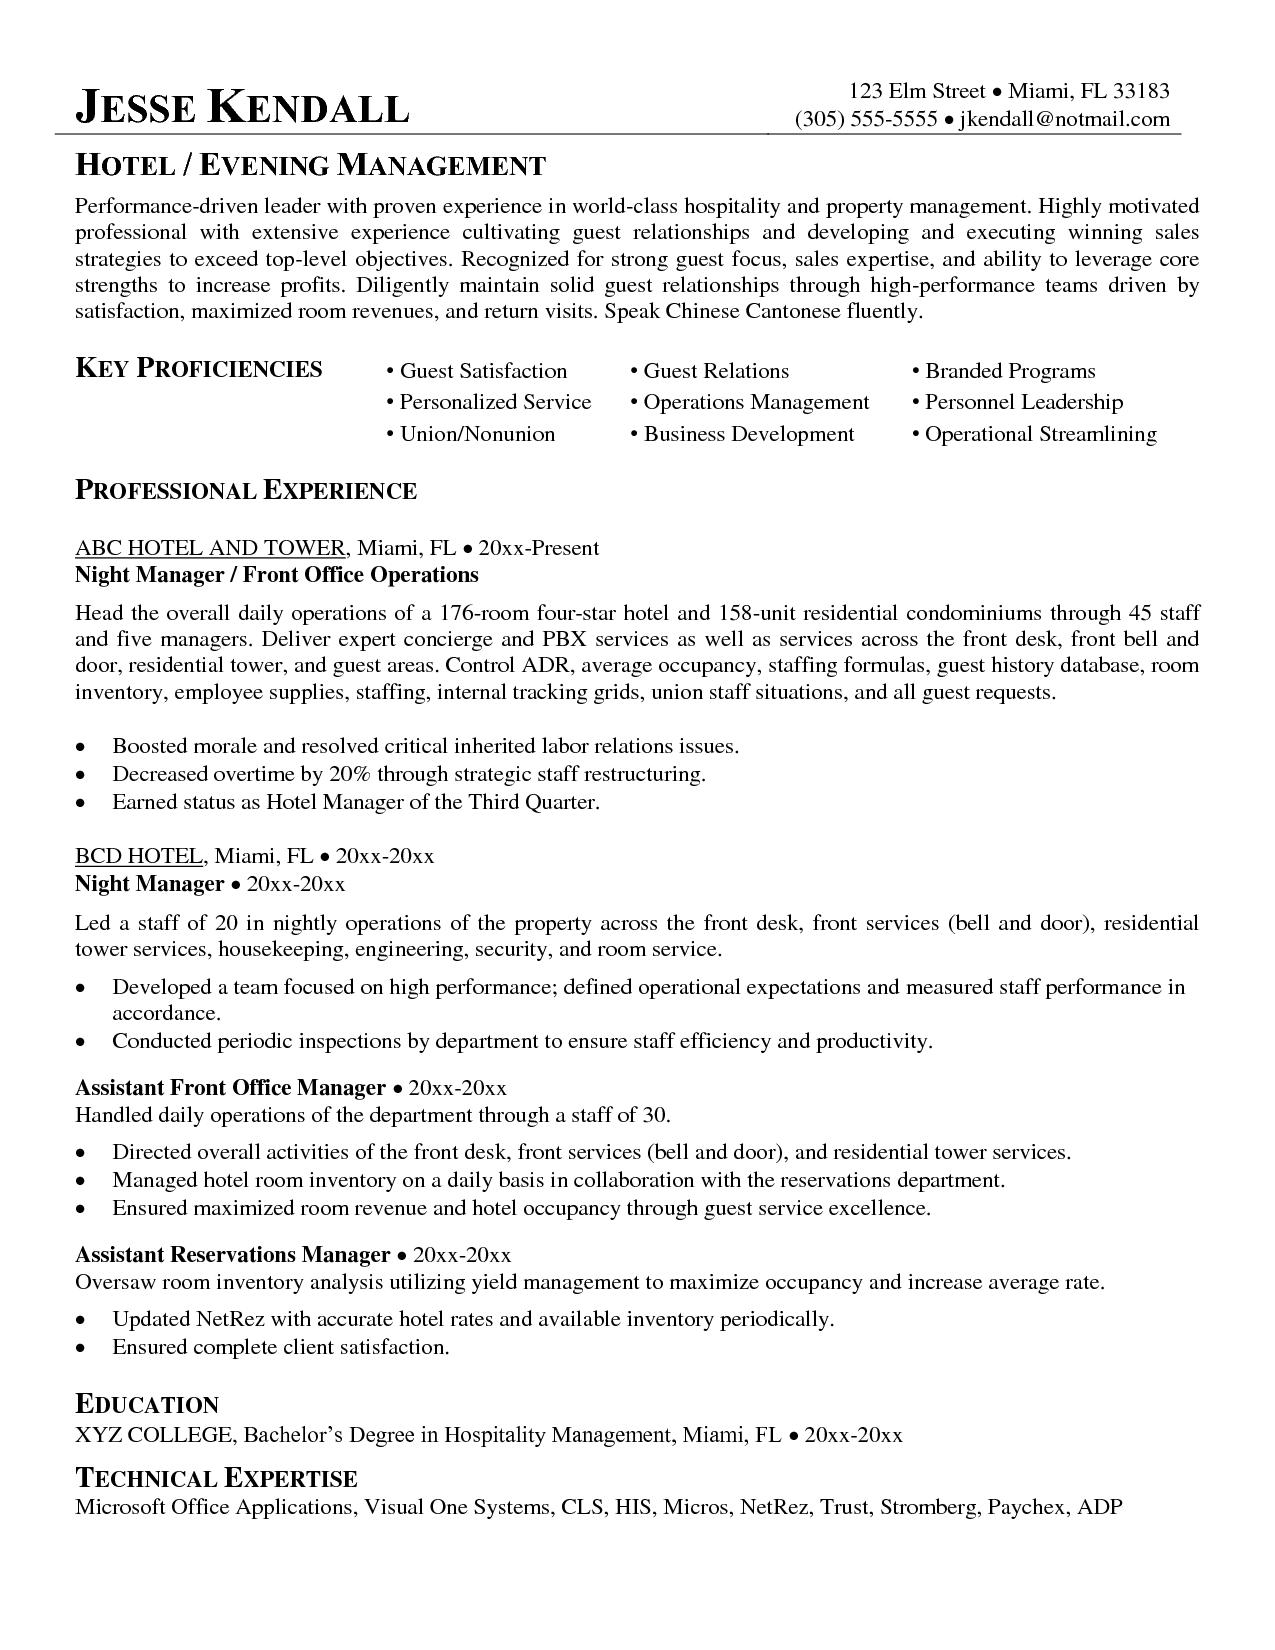 Hotel Management Resume Sample, Hotel Management Resume